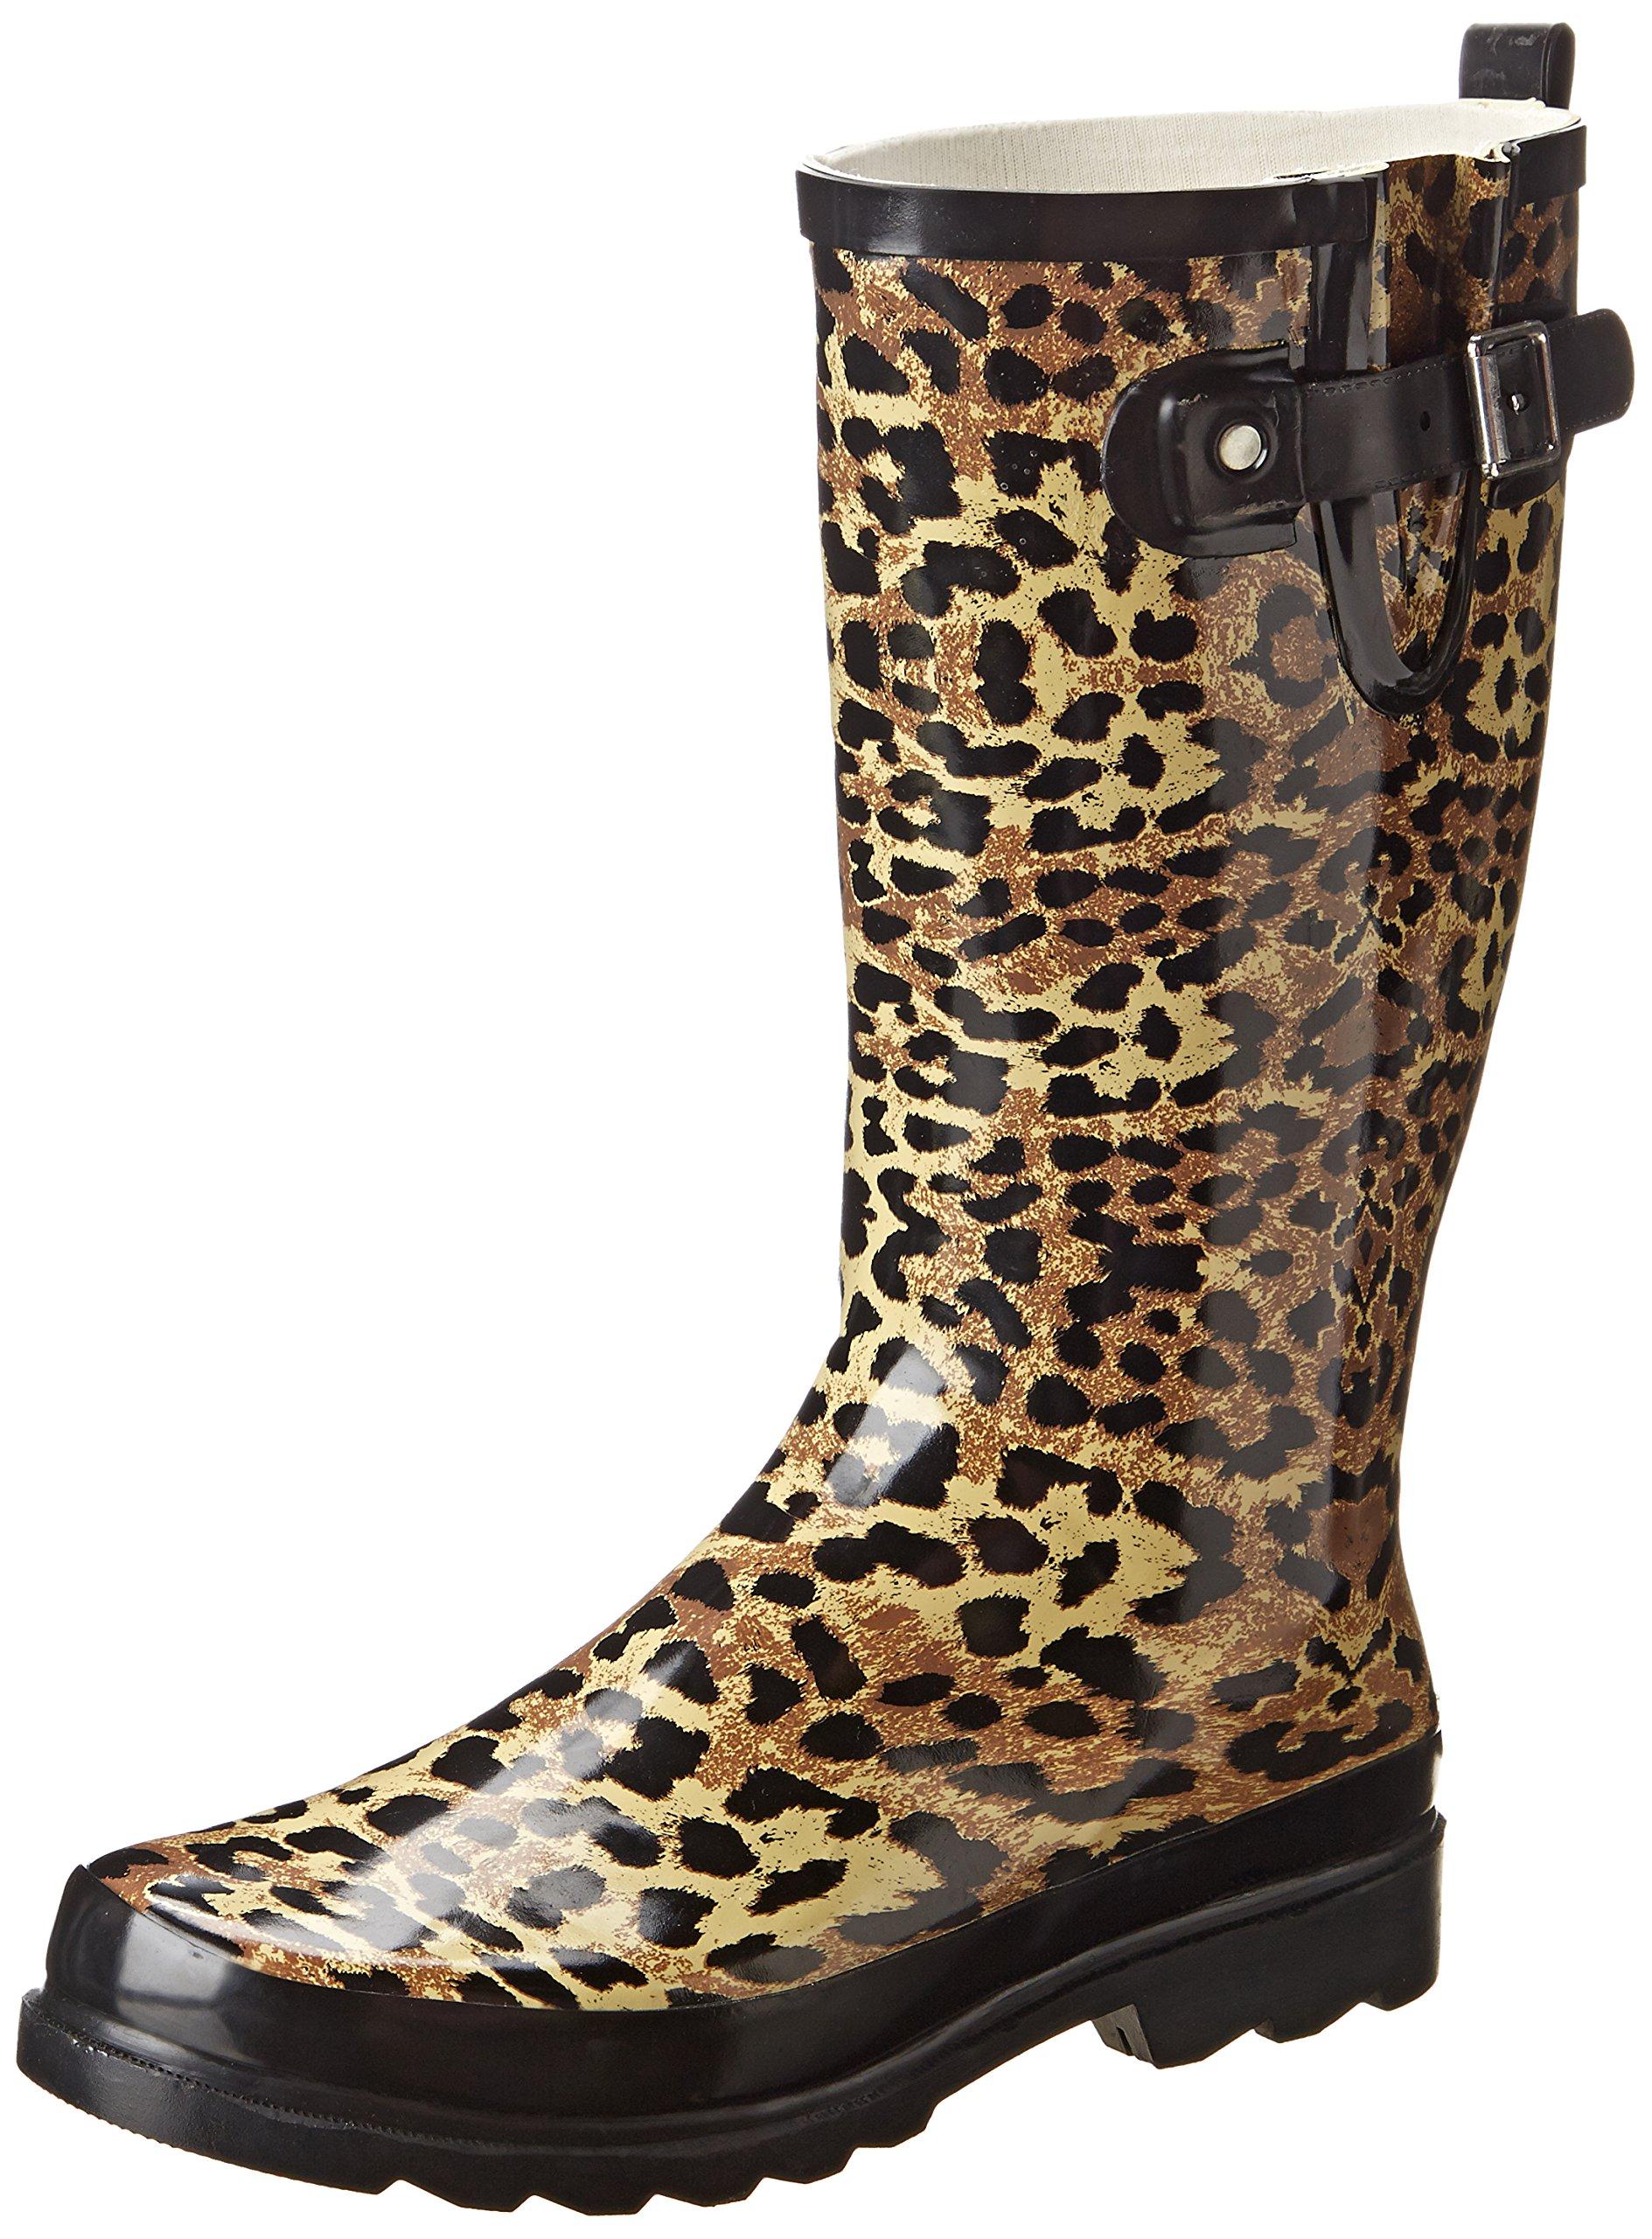 Western Chief Women's Leopard Exotic Rain Boot,Tan,10 M US